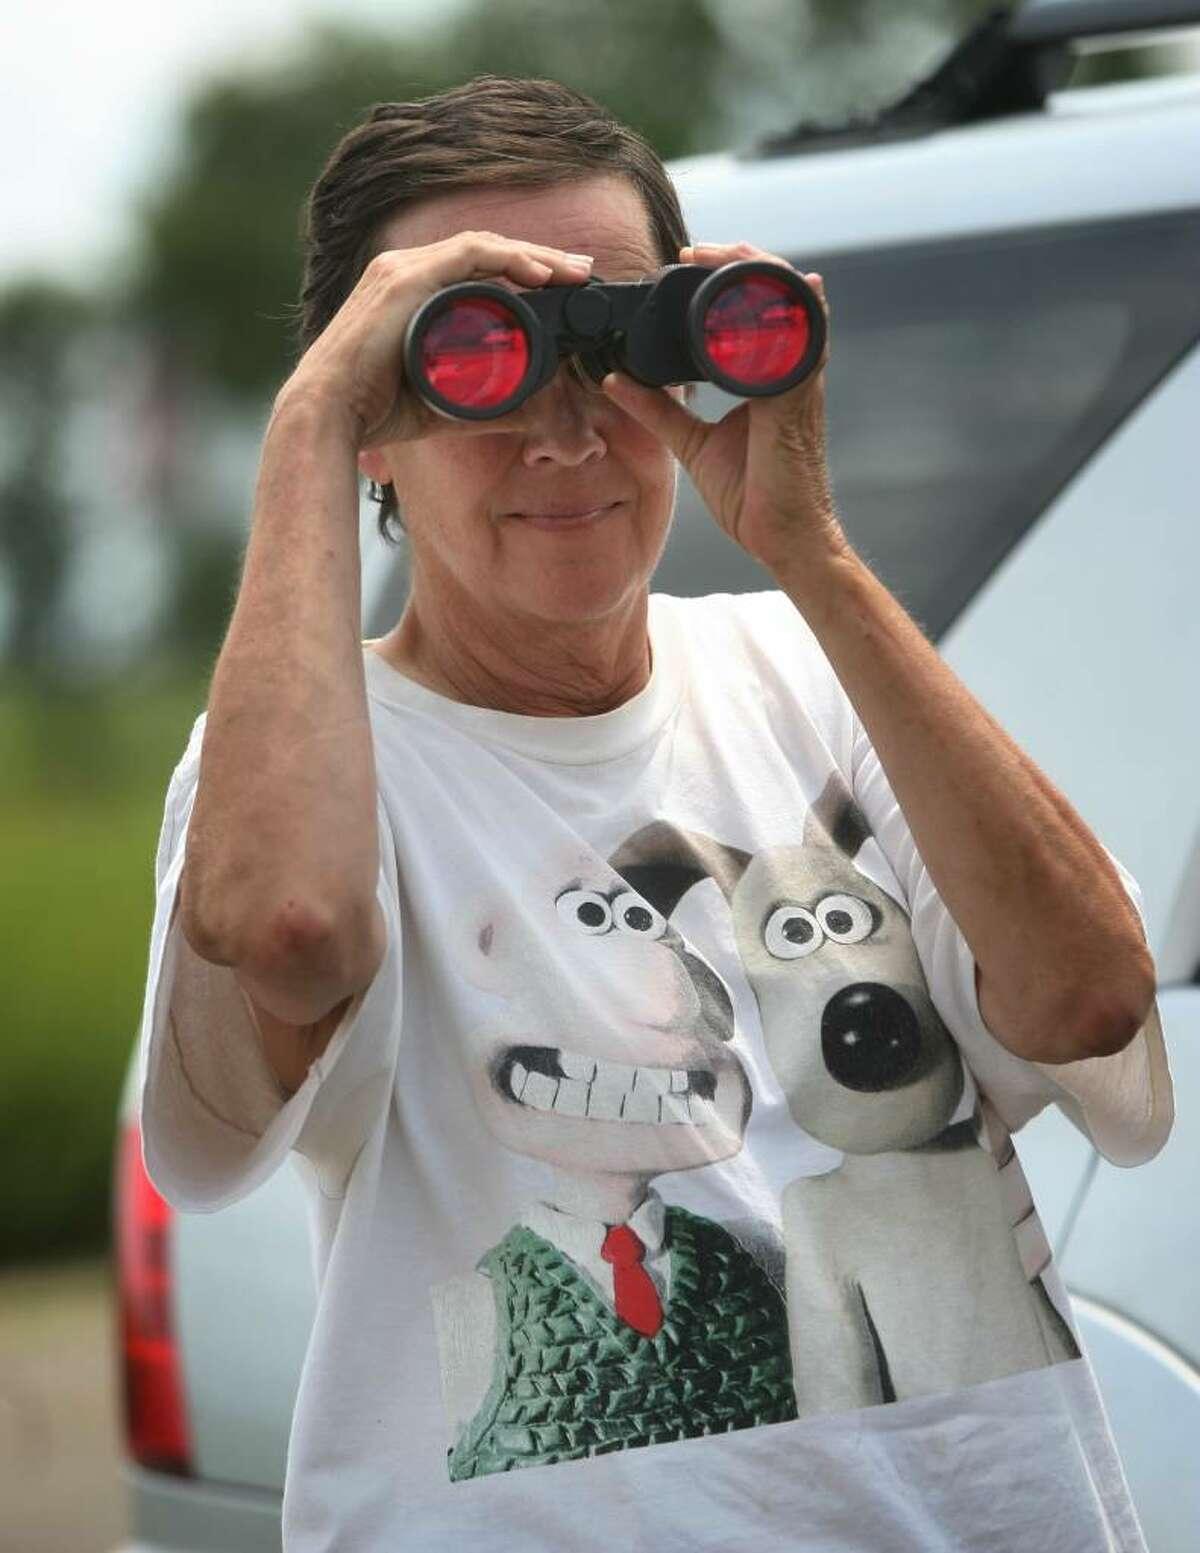 Birder Sam Saulys of Branford looks to spot the white-tailed kite on Stratford Point on Tuesday, August 3, 2010.